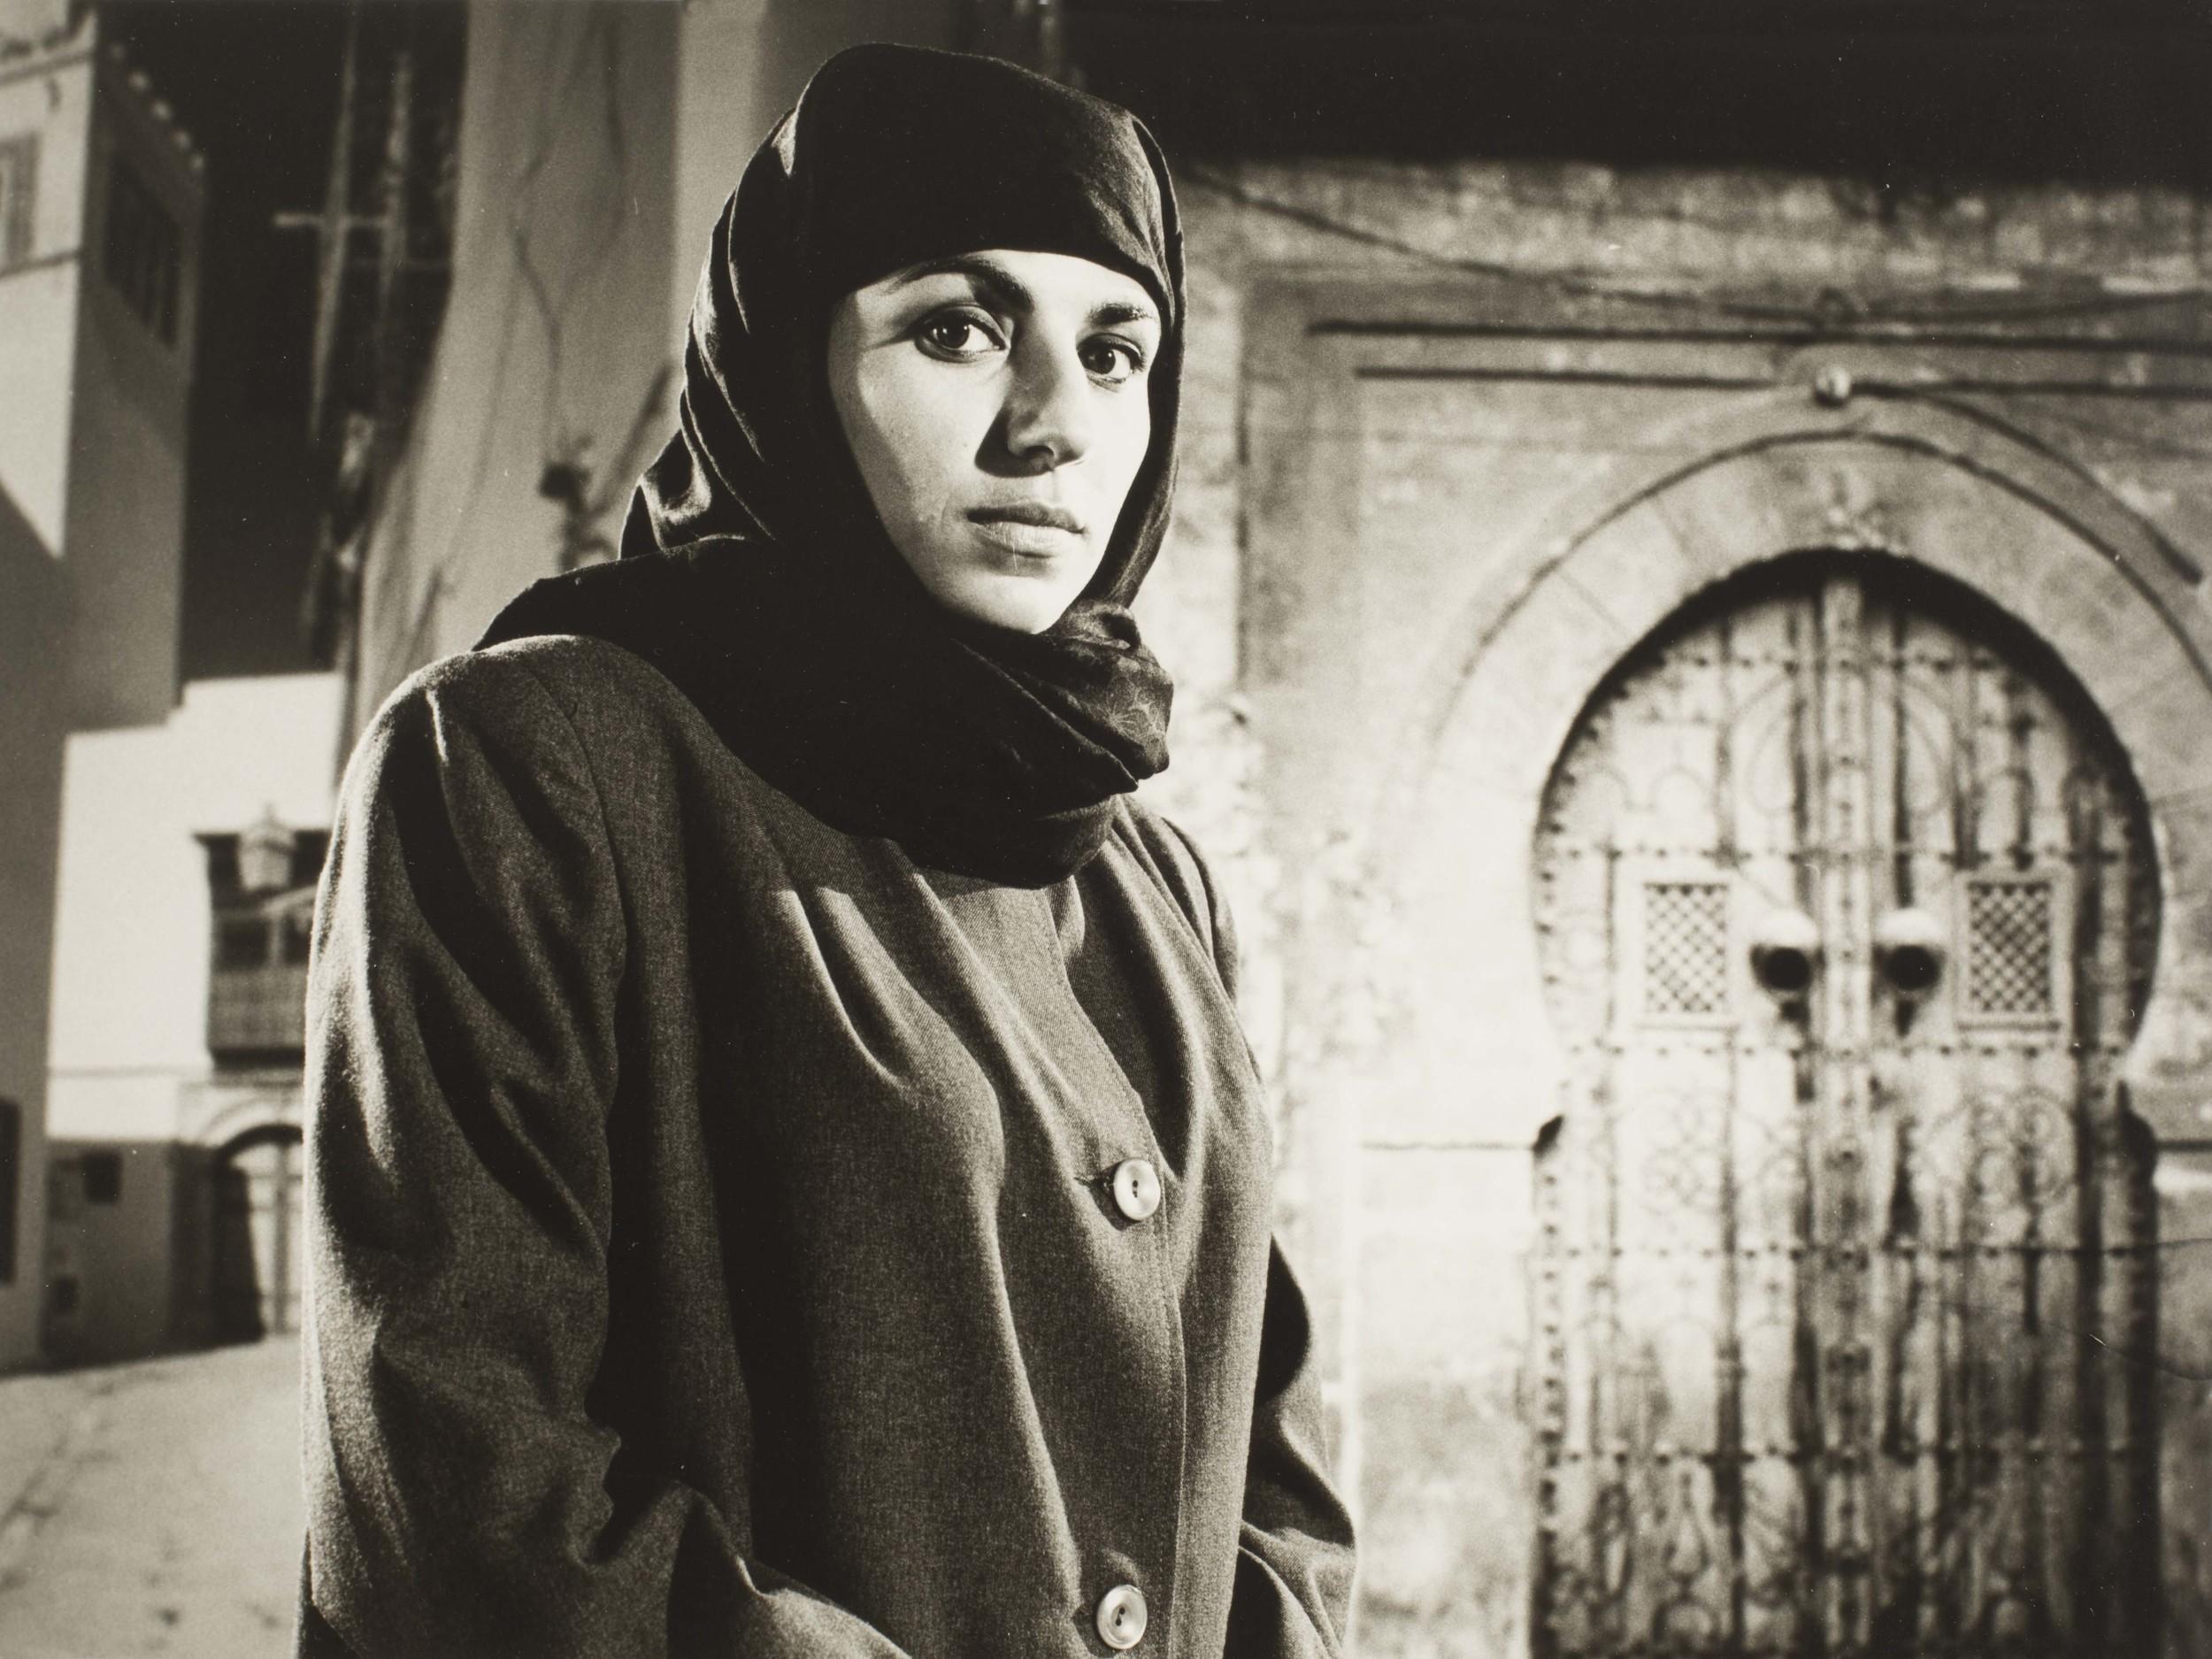 Still from Frantz Fanon, Black Skin White Mask . director Isaac Julien. 1995